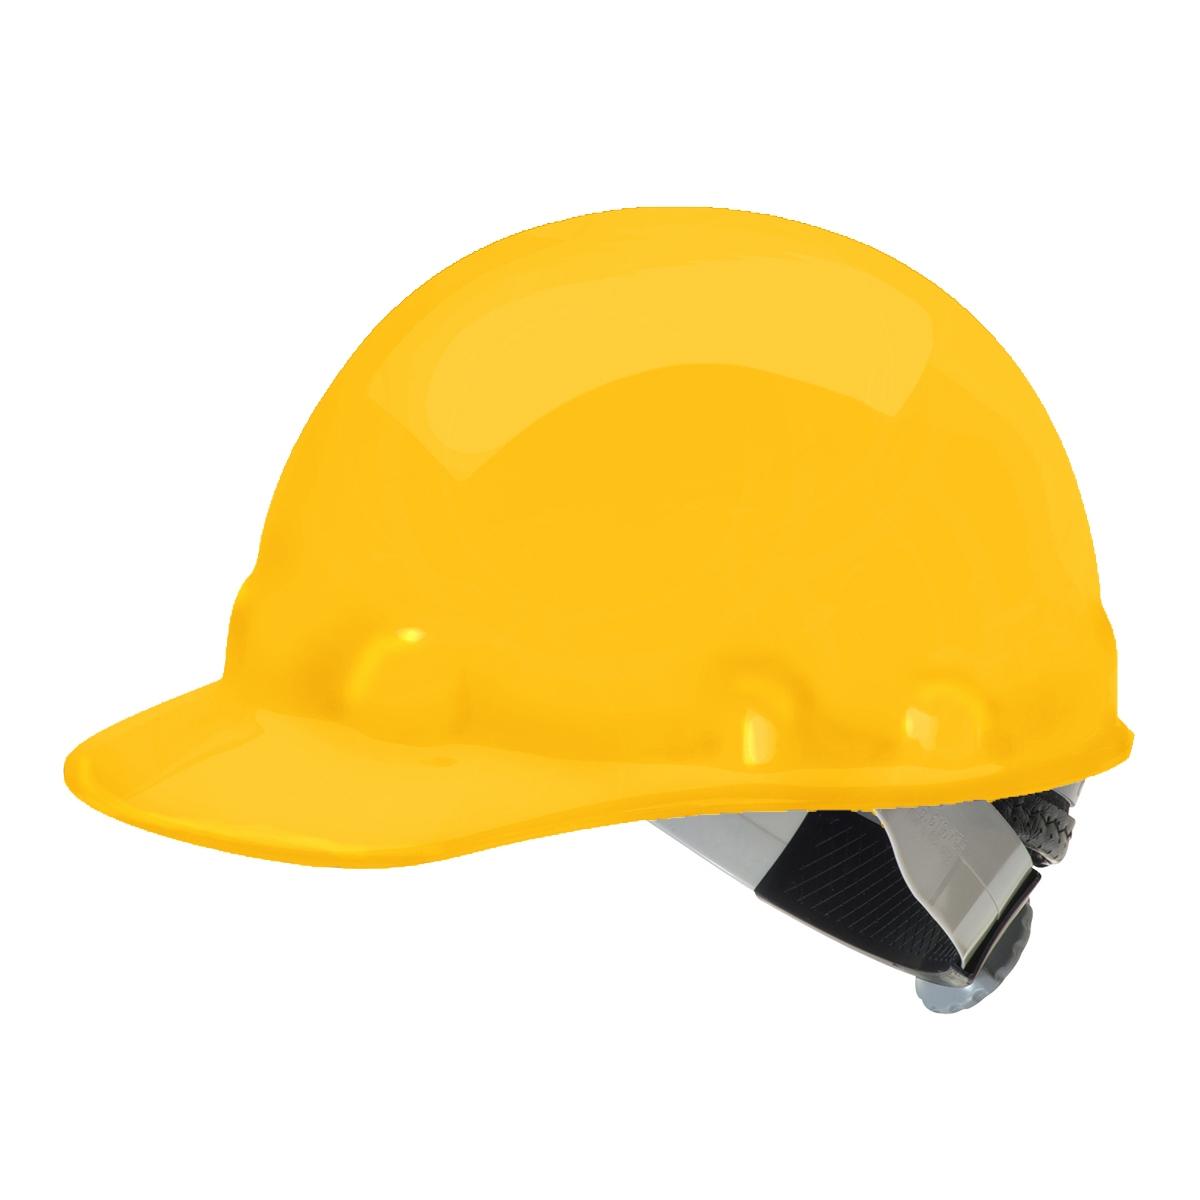 yellow hard hat clipart - photo #47